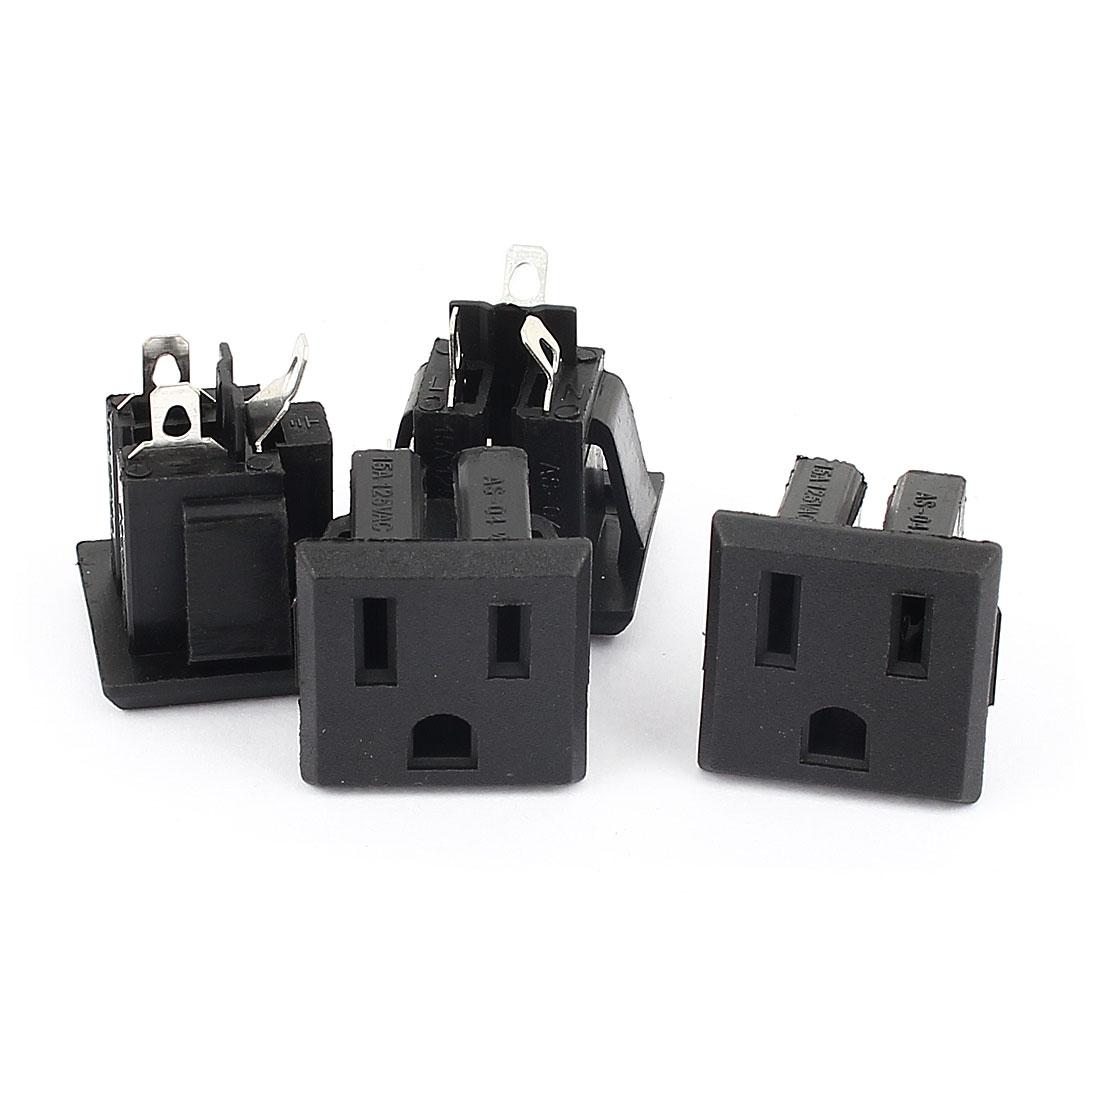 4Pcs AC 125V 15A US Plug 3 Terminals Socket Power Female Outlet Connector Black